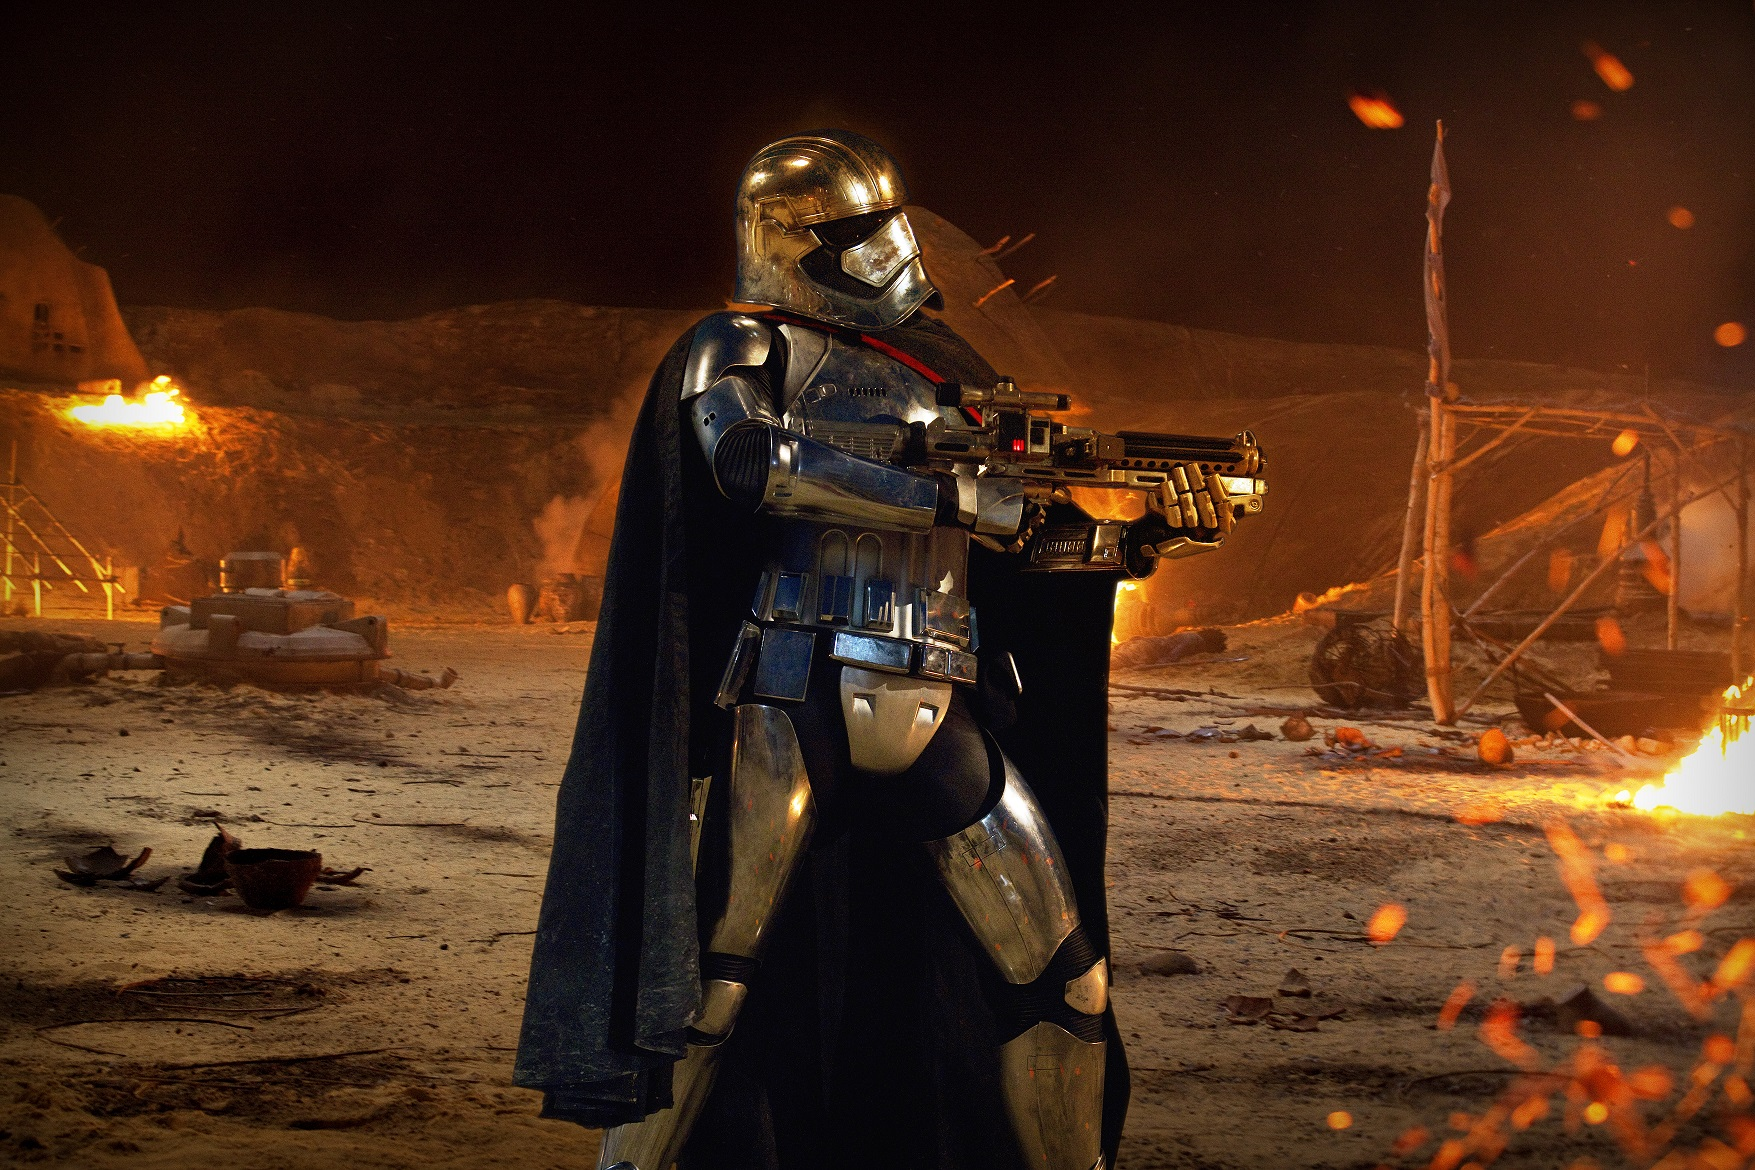 Star Wars: The Force Awakens..Captain Phasma (Gwendoline Christie)..Ph: Elena Dorfman..? 2015 Lucasfilm Ltd. & TM. All Right Reserved...